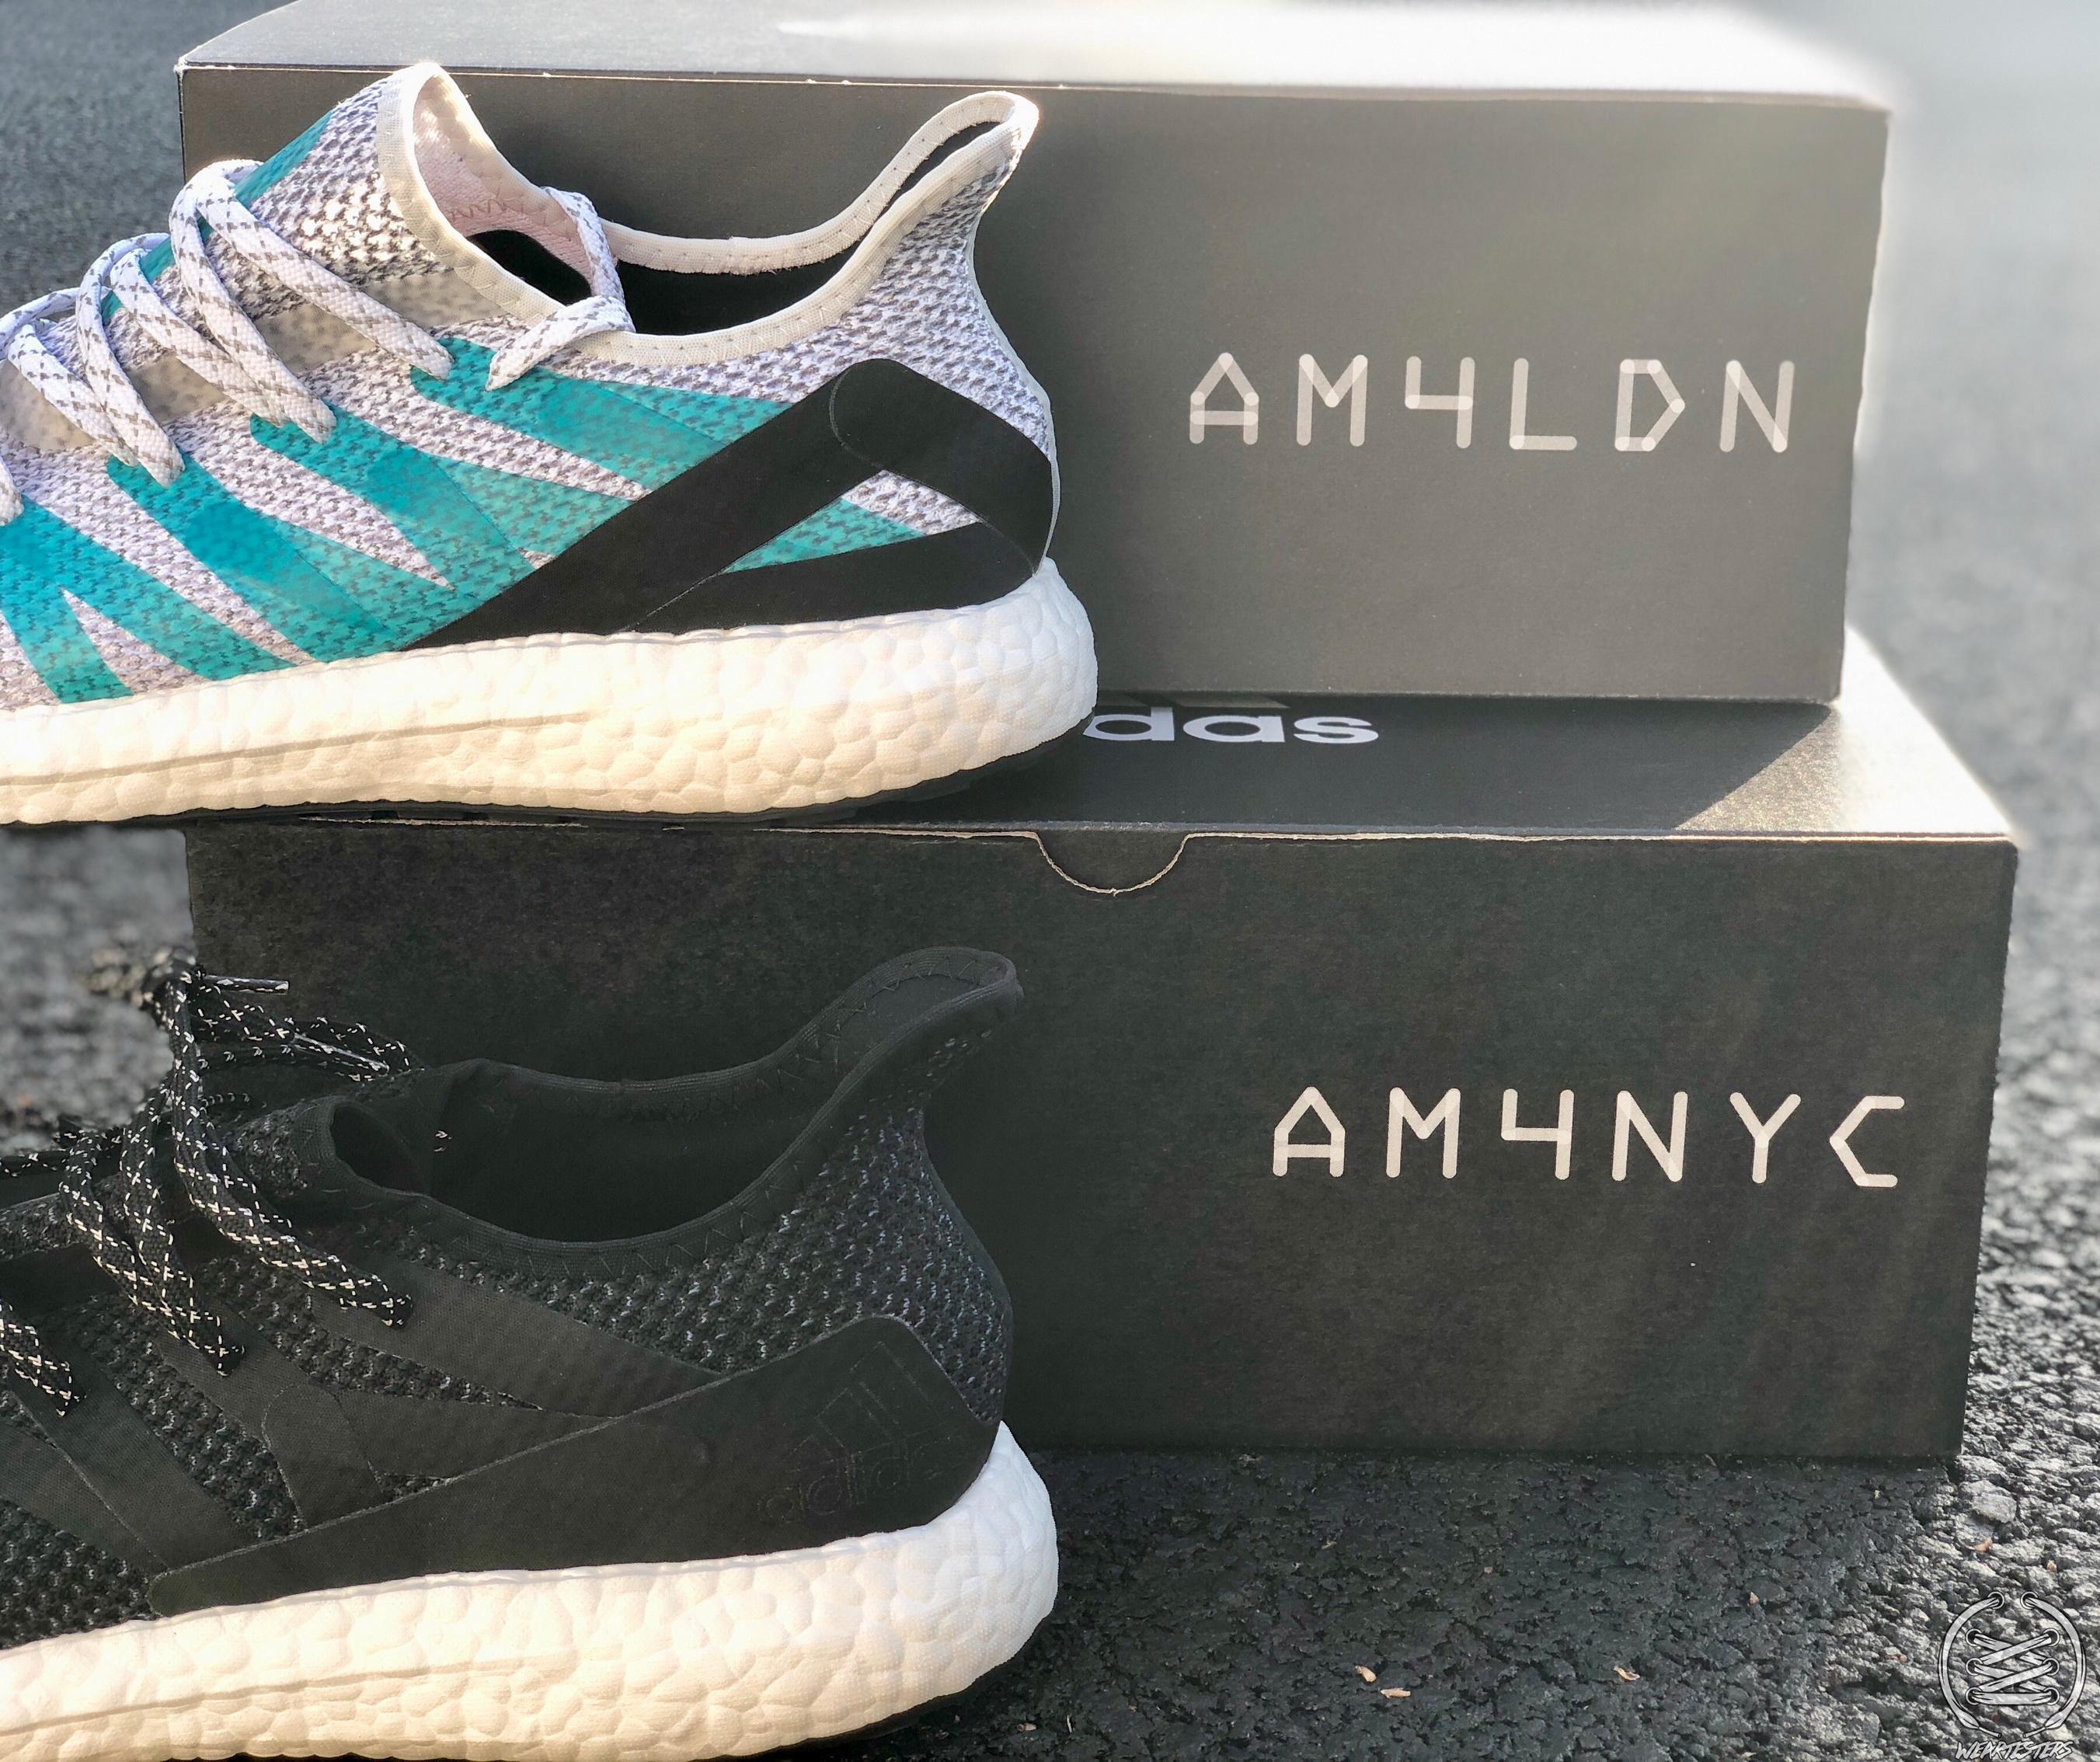 adidas AM4LDN AM4NYC 0